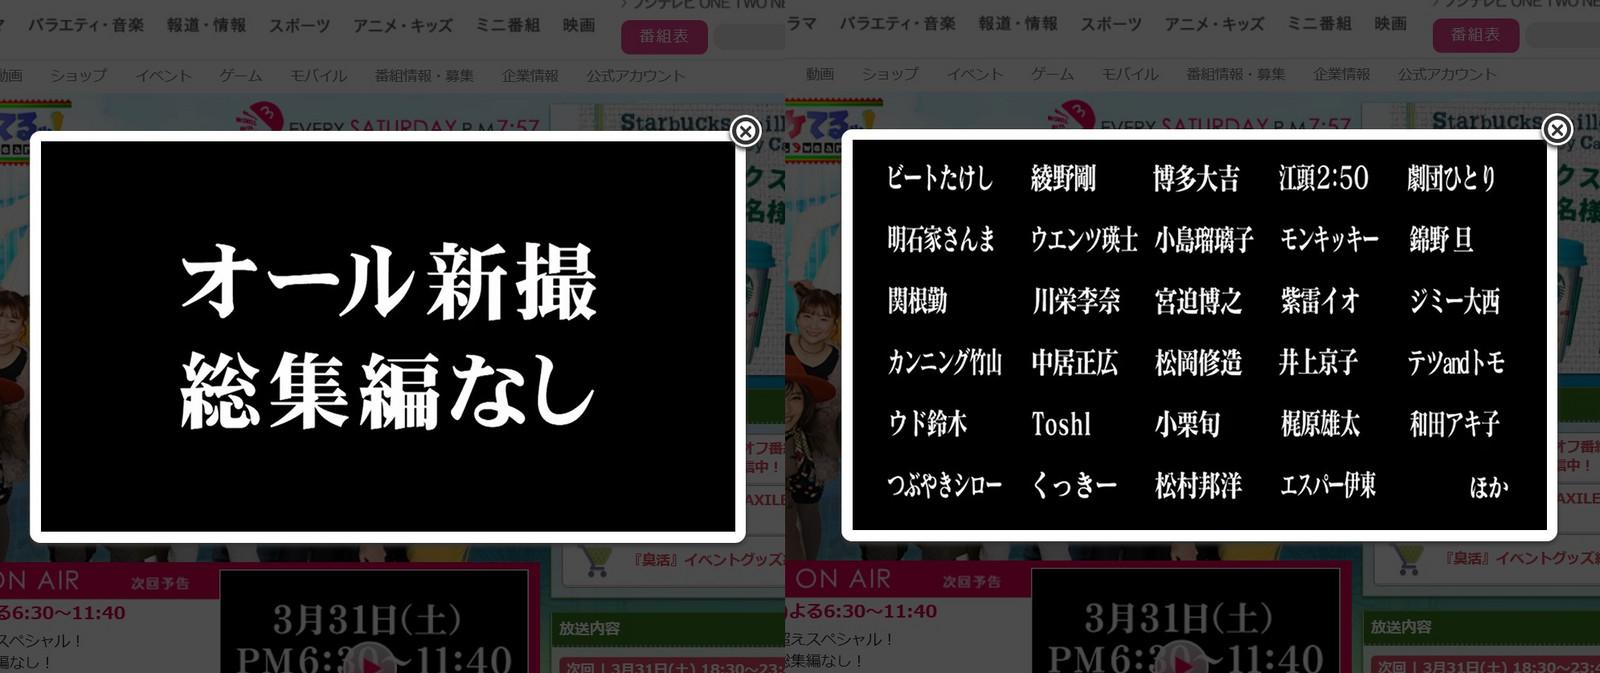 Category:テレビ朝日のバラエテ...